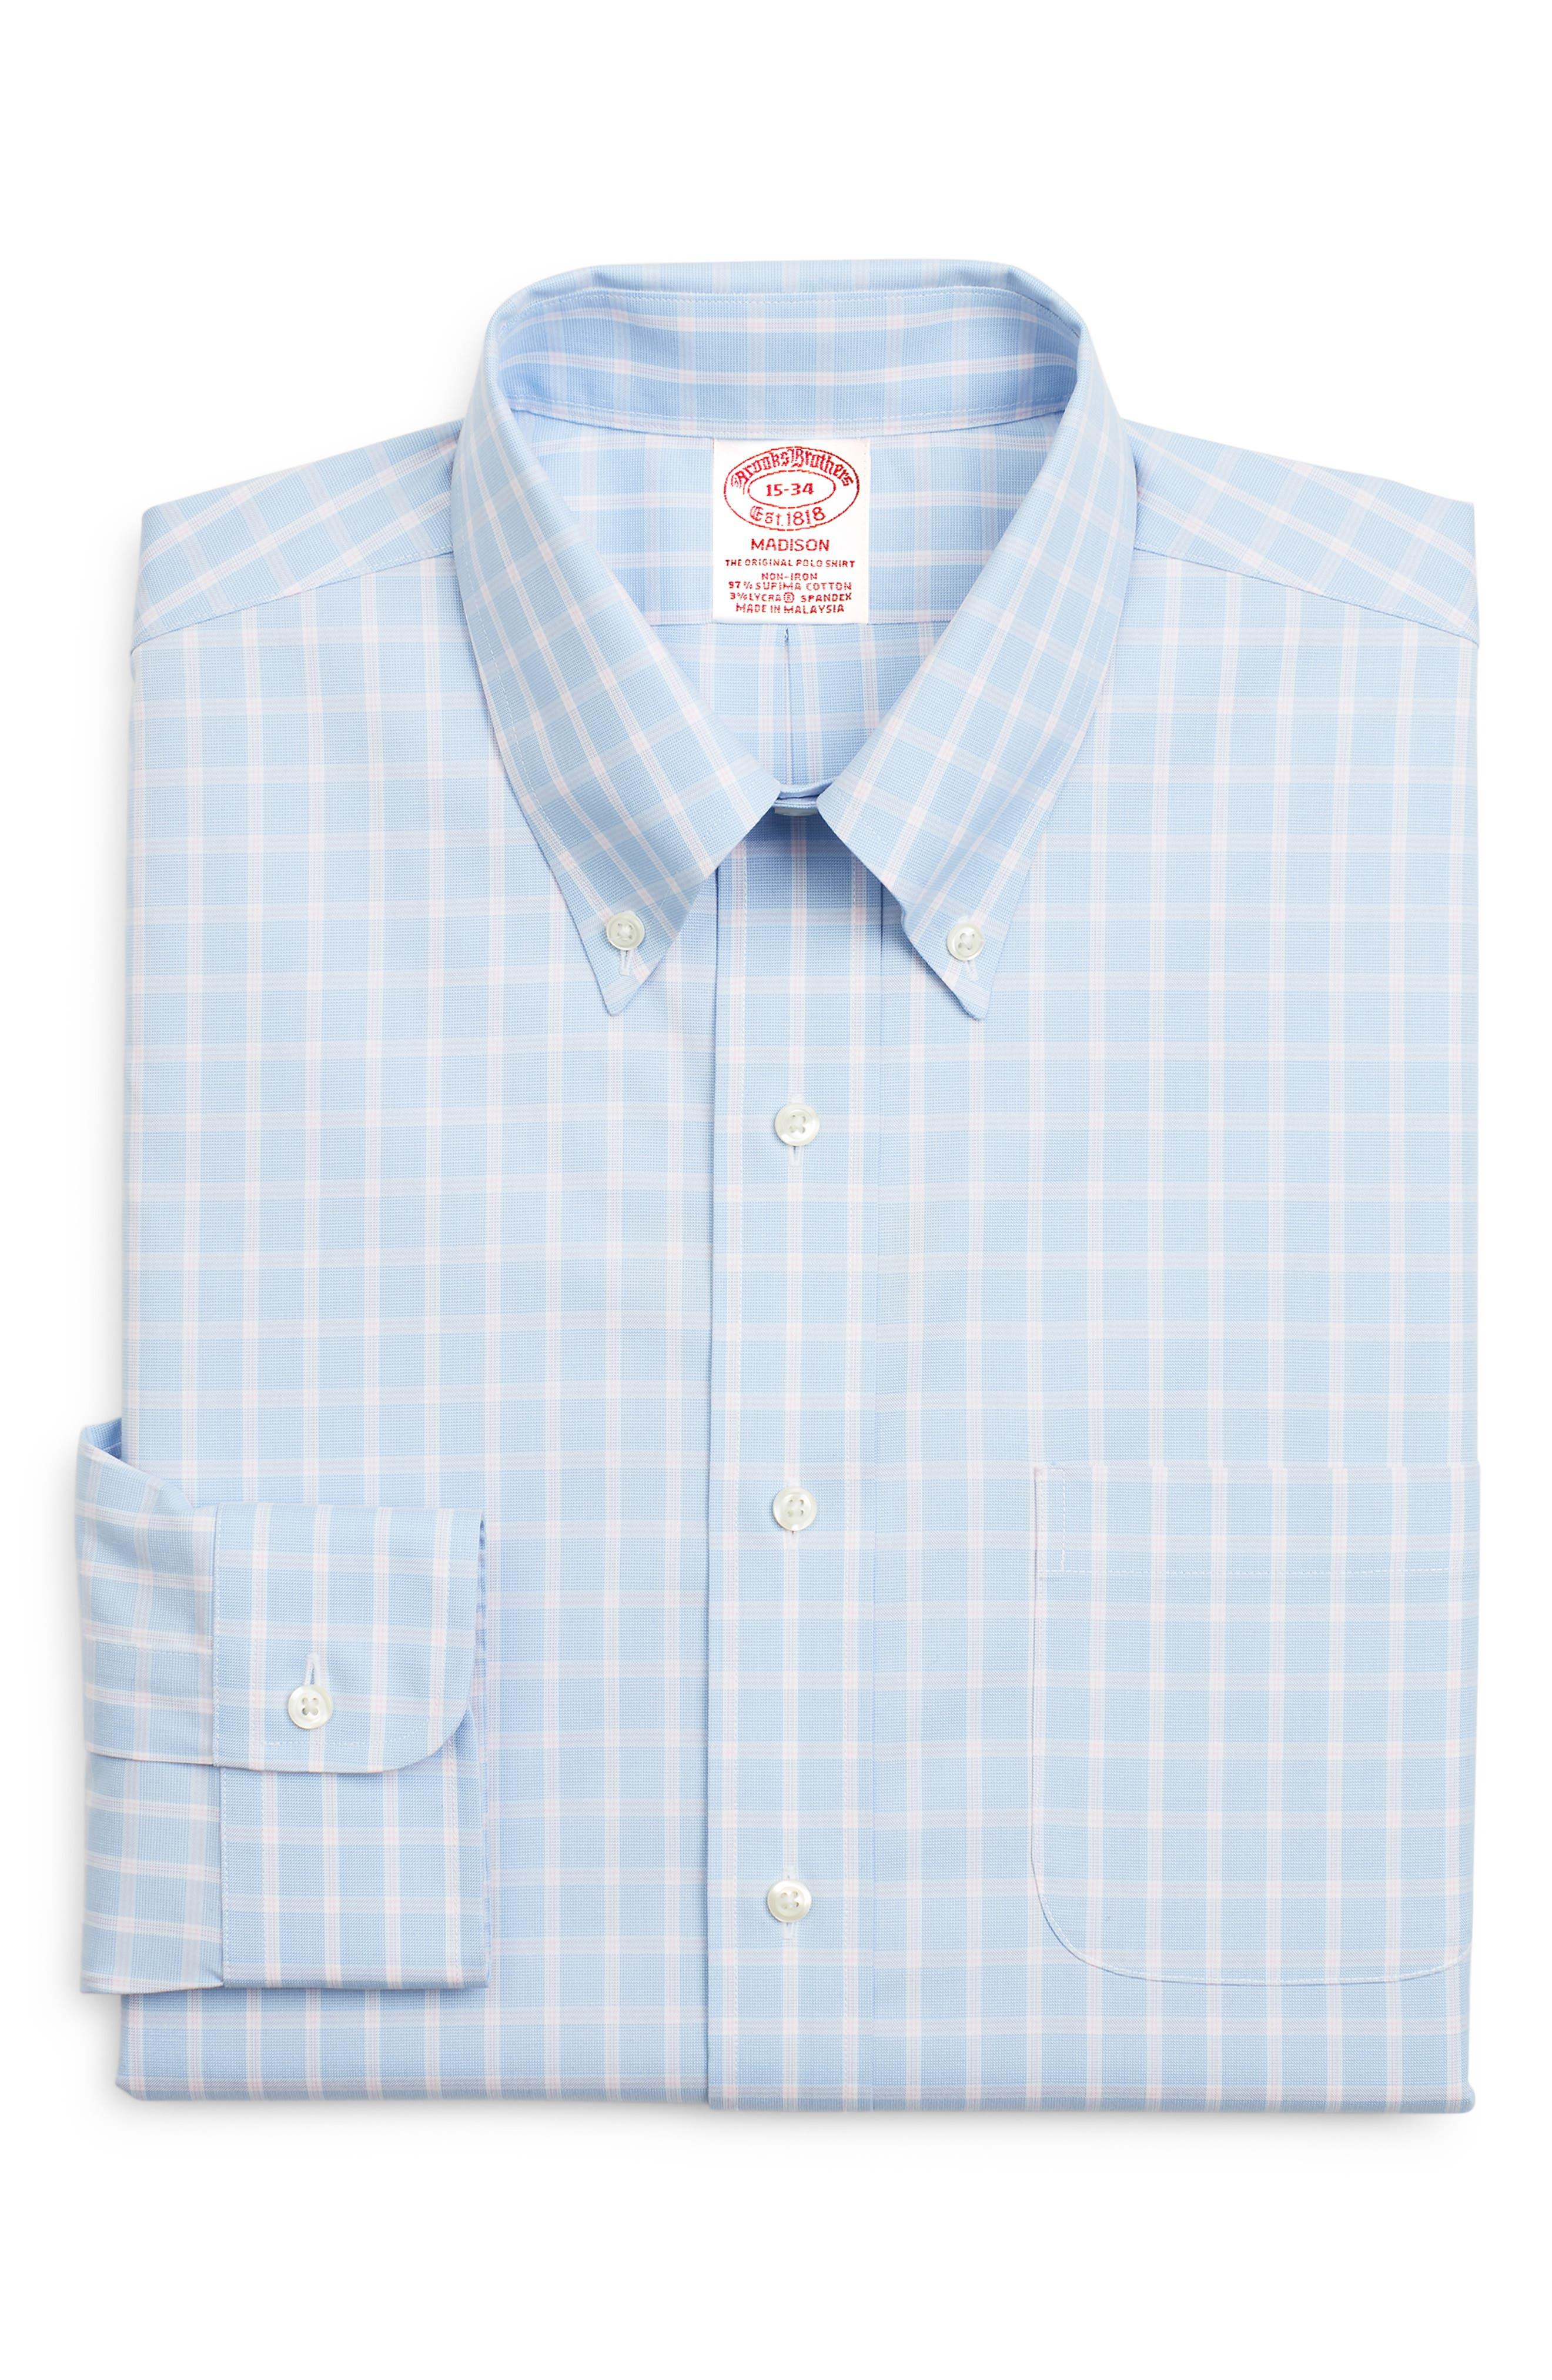 Brooks Brothers Madison Classic Fit Stretch Plaid Dress Shirt